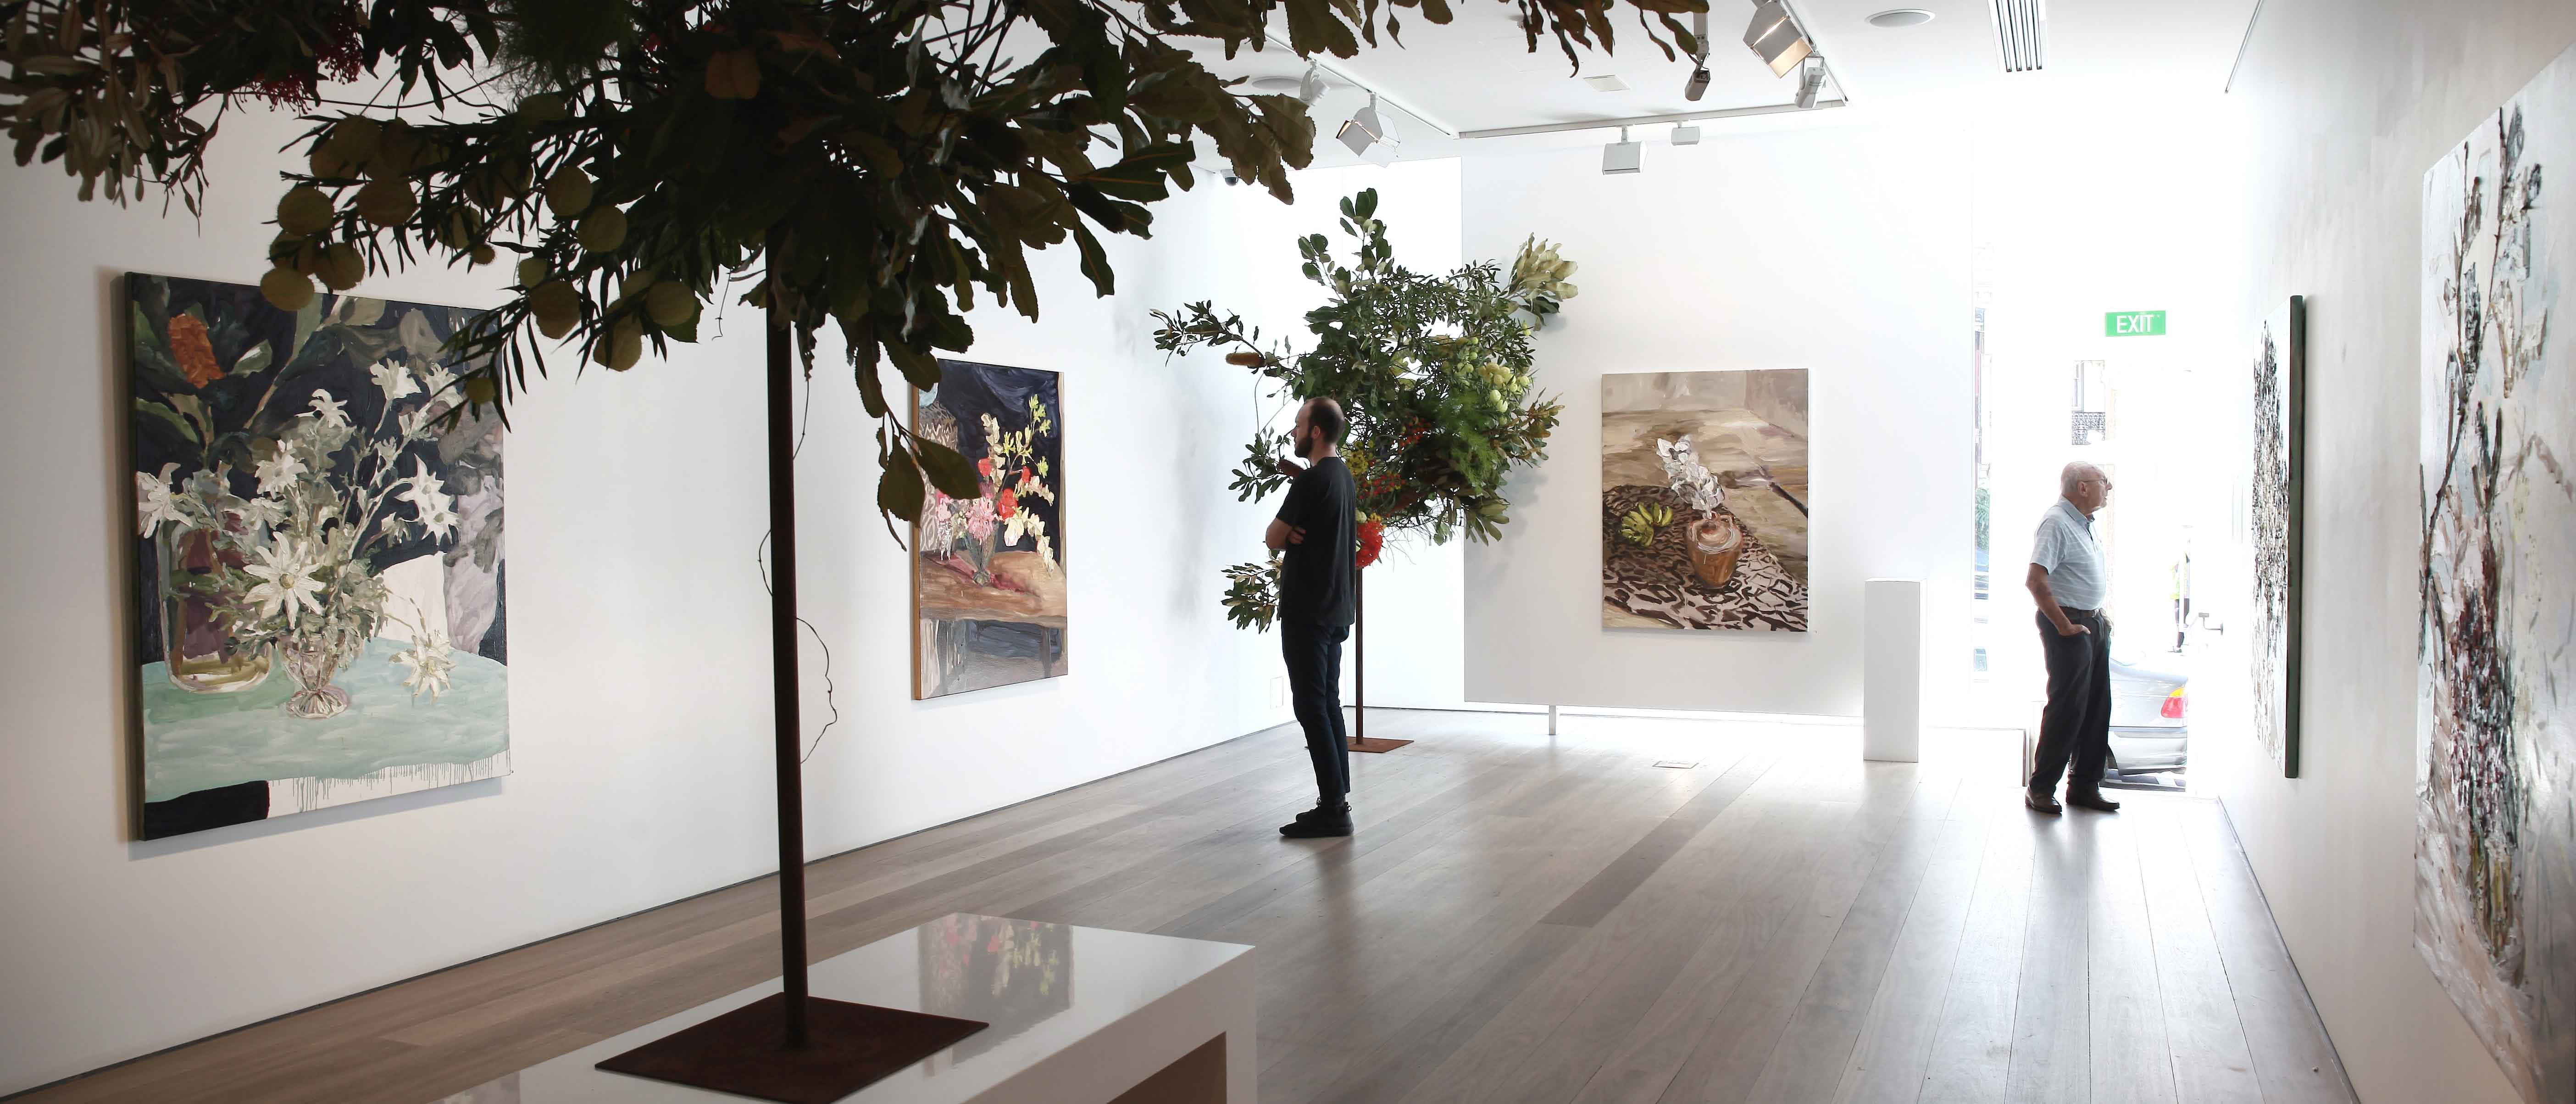 In Full Bloom: Artist Laura Jones